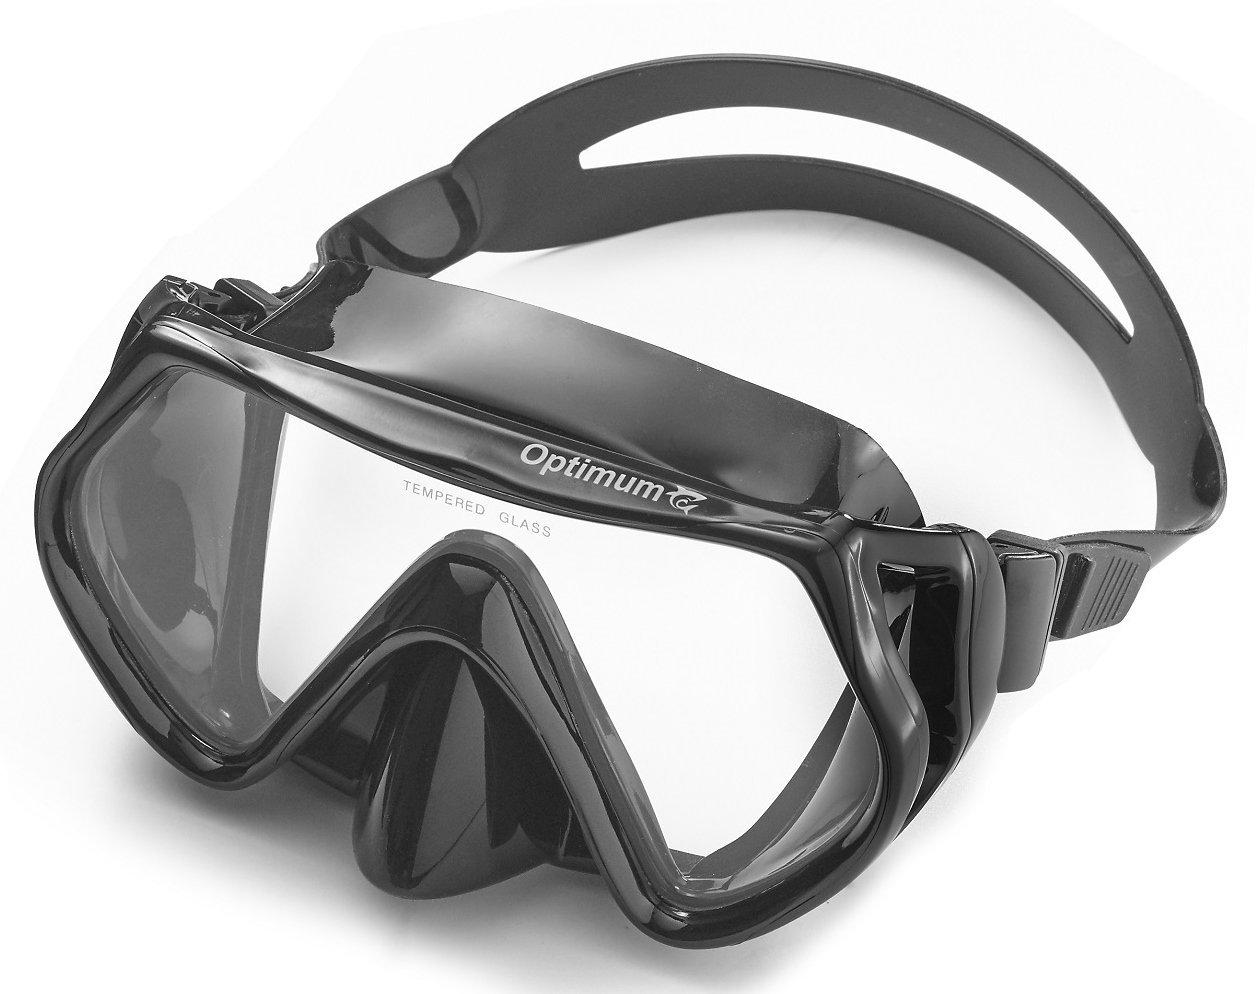 Top 10 Best Scuba Diving Masks